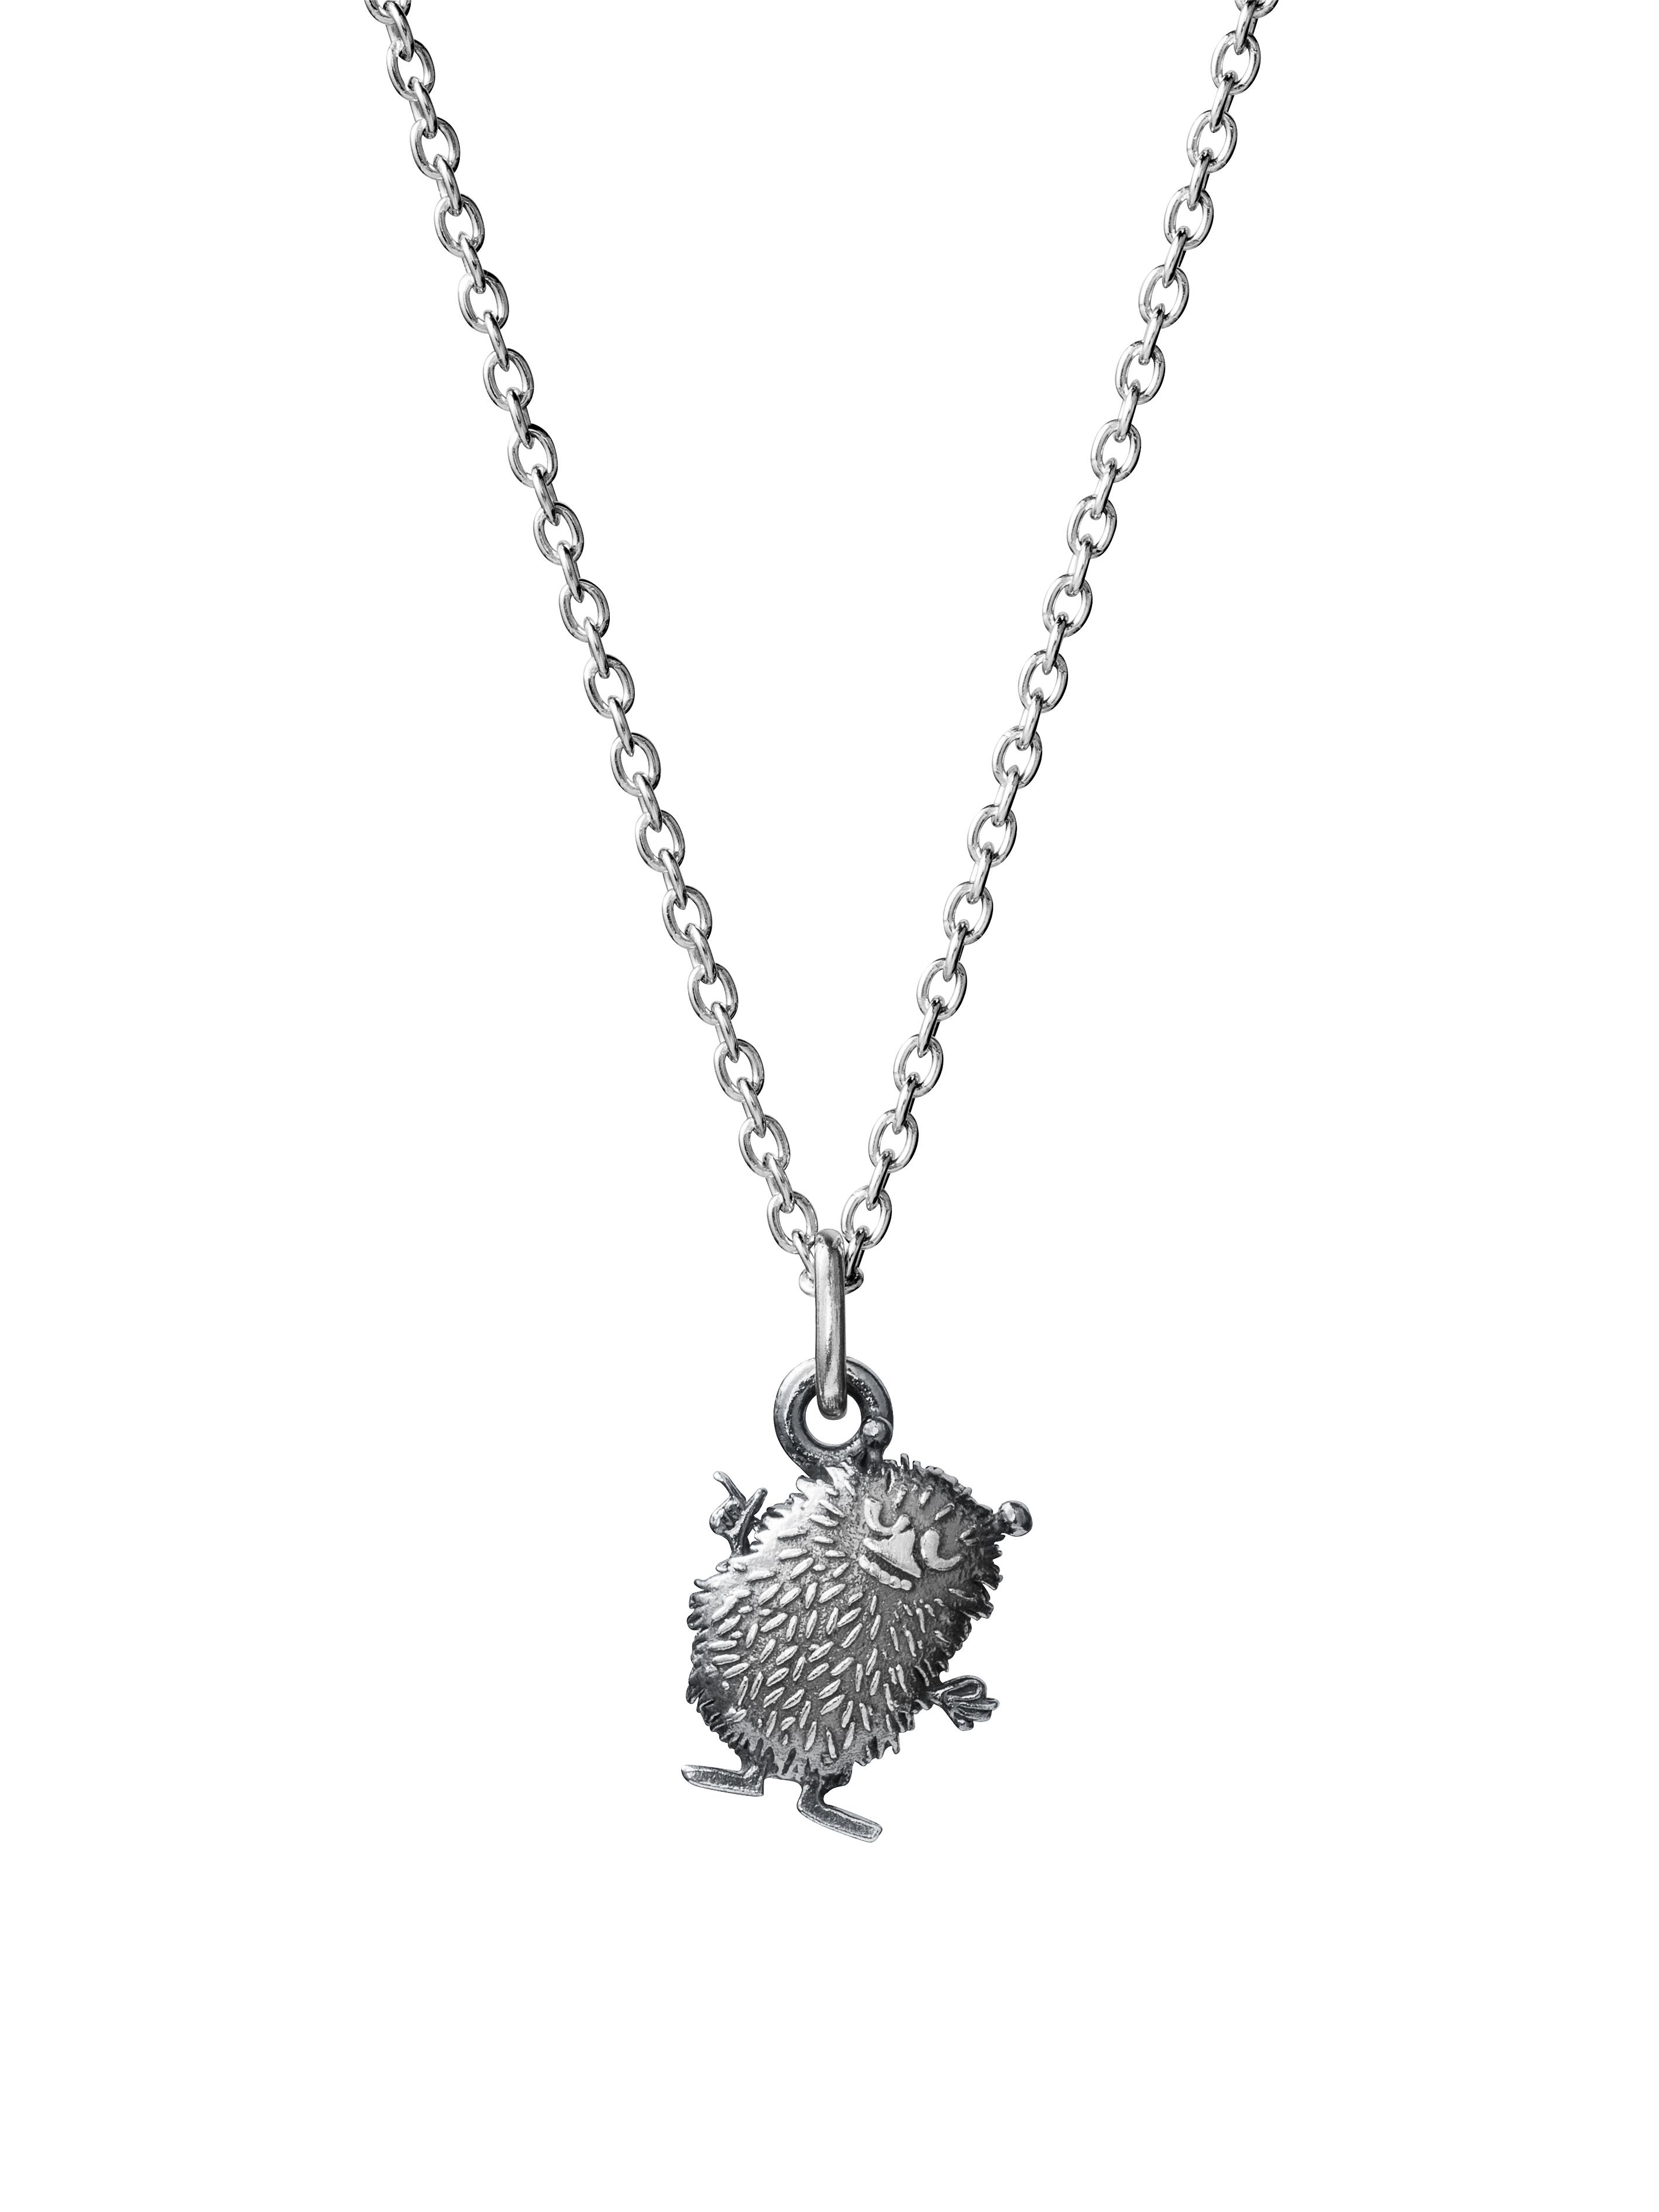 Saurum Stinky silver pendant small